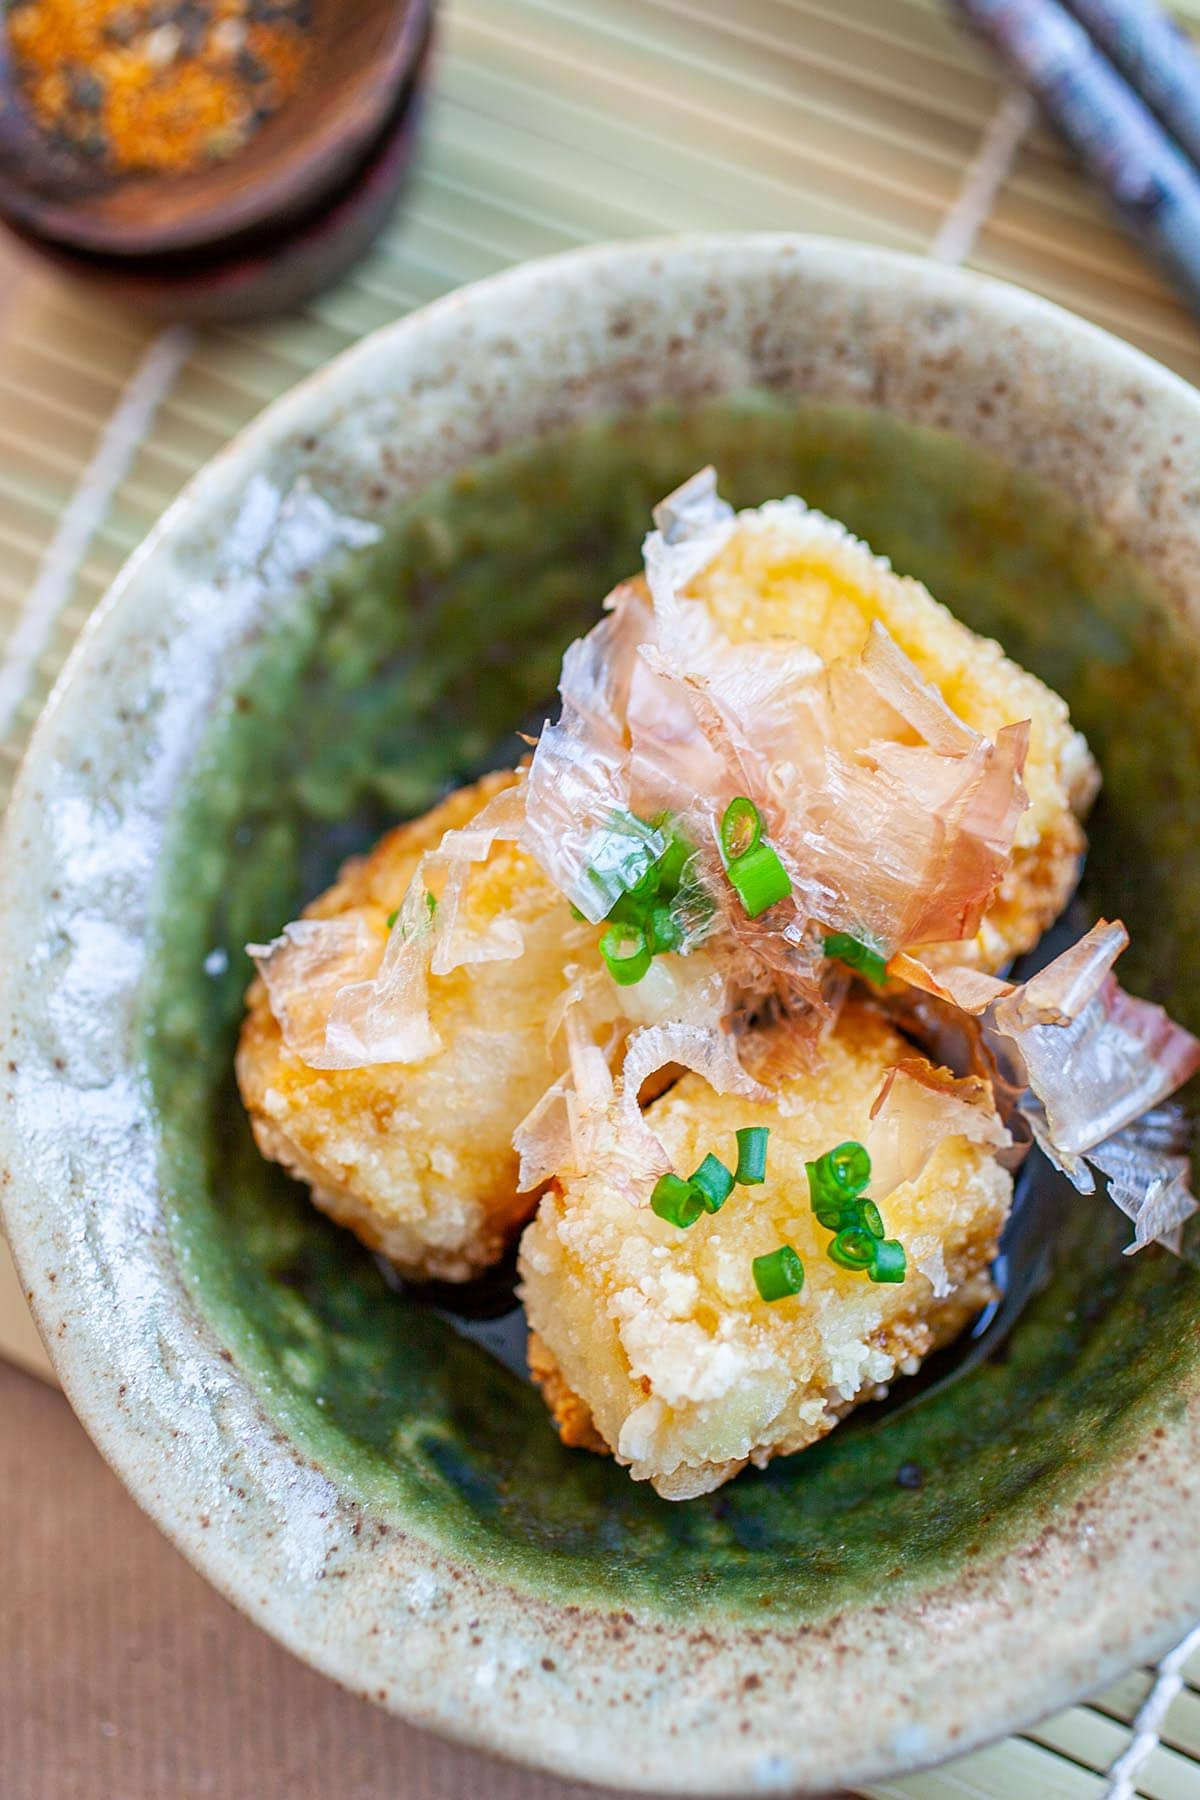 Agedashi tofu in a bowl.